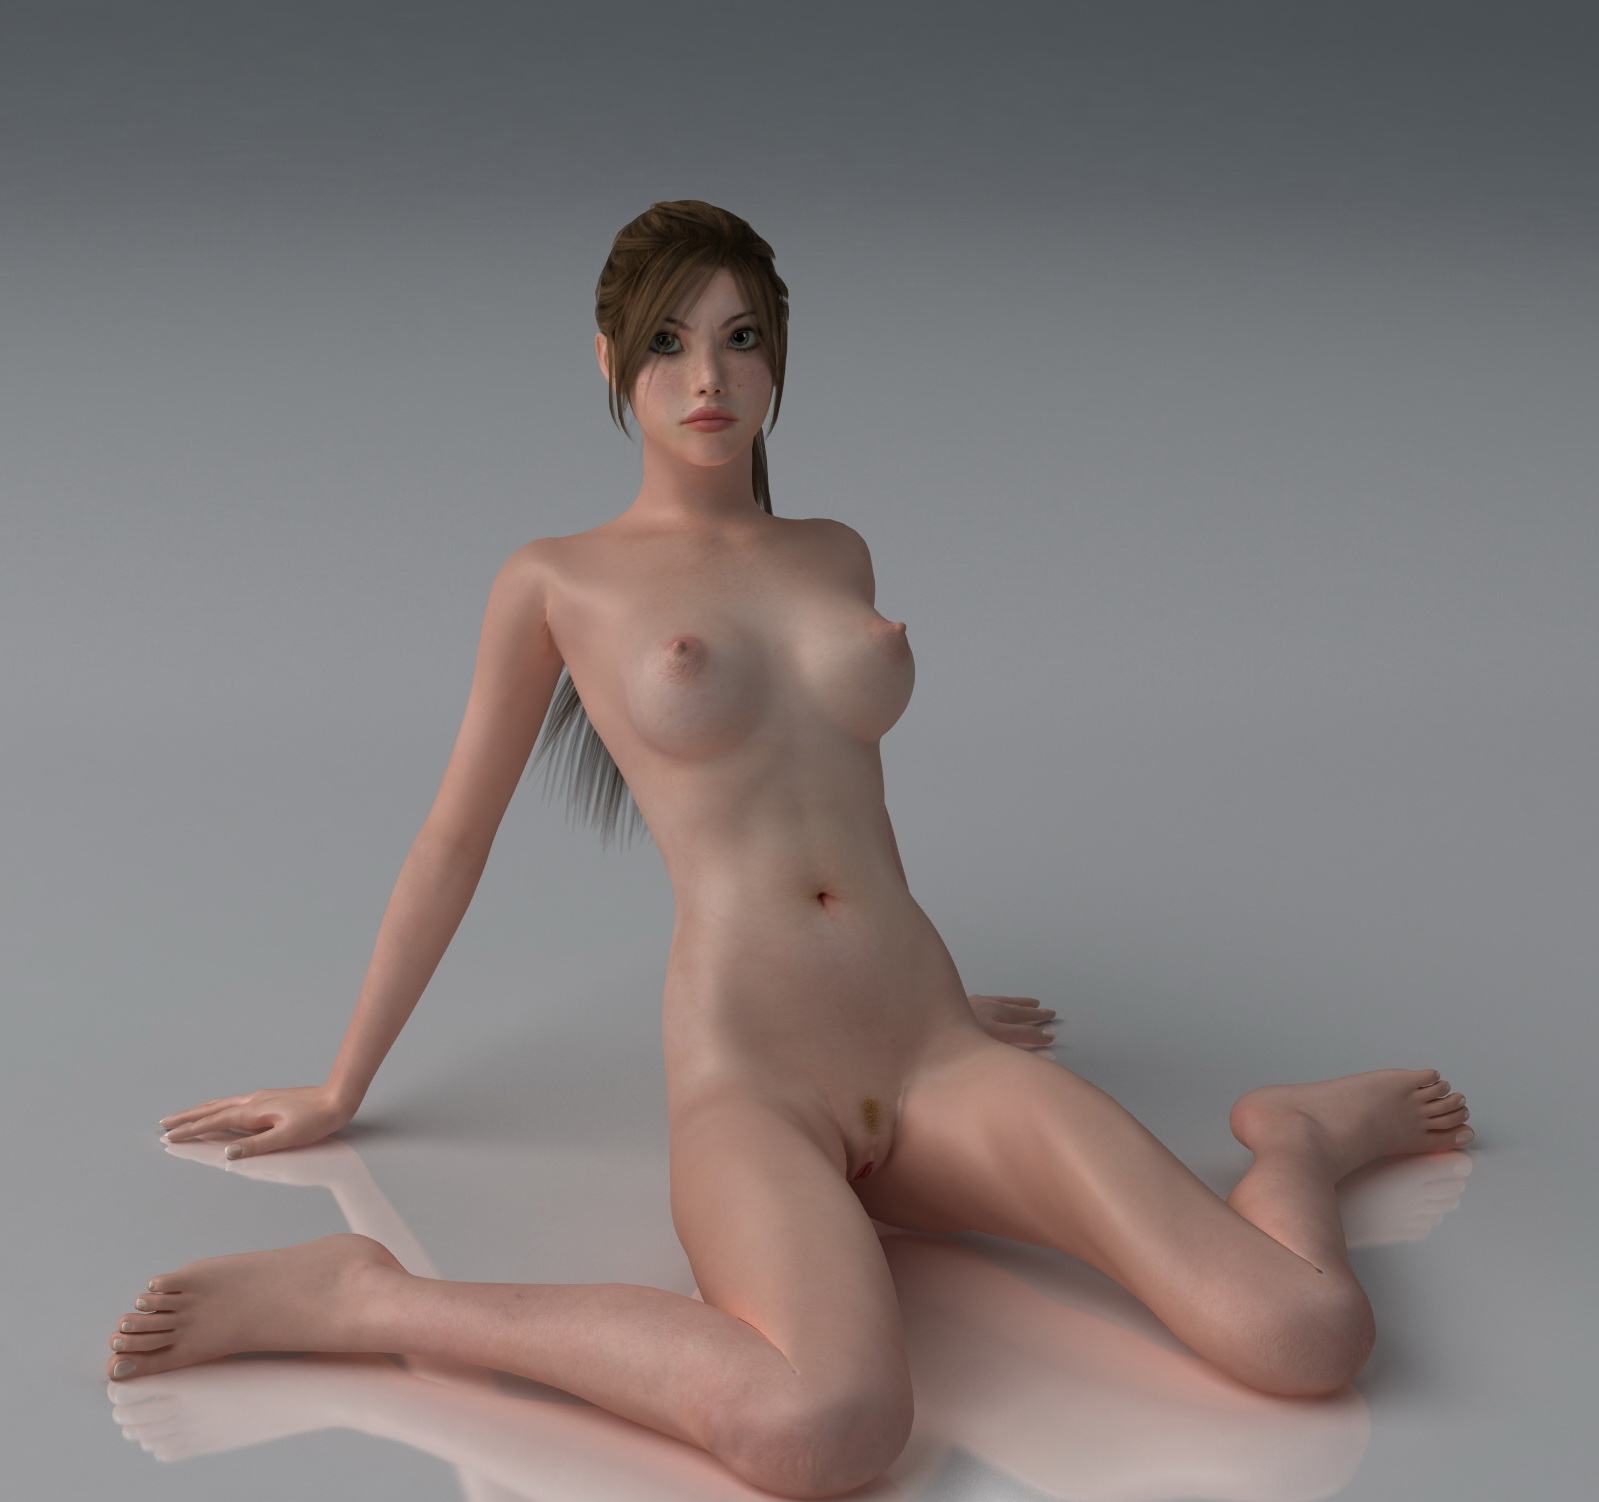 Druarf human xvideo naked vids